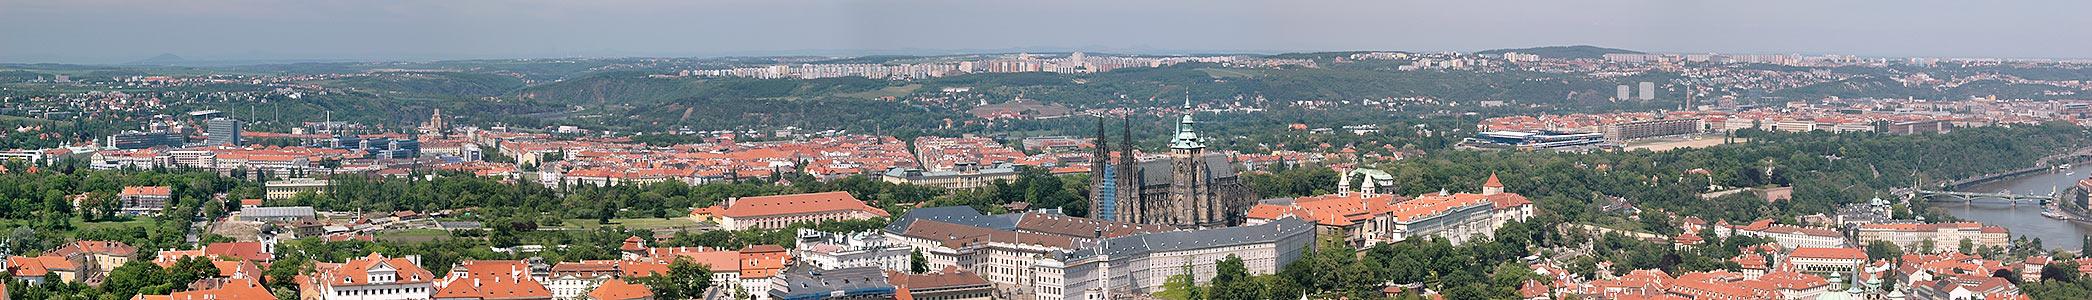 Prag: Burg und Umgebung